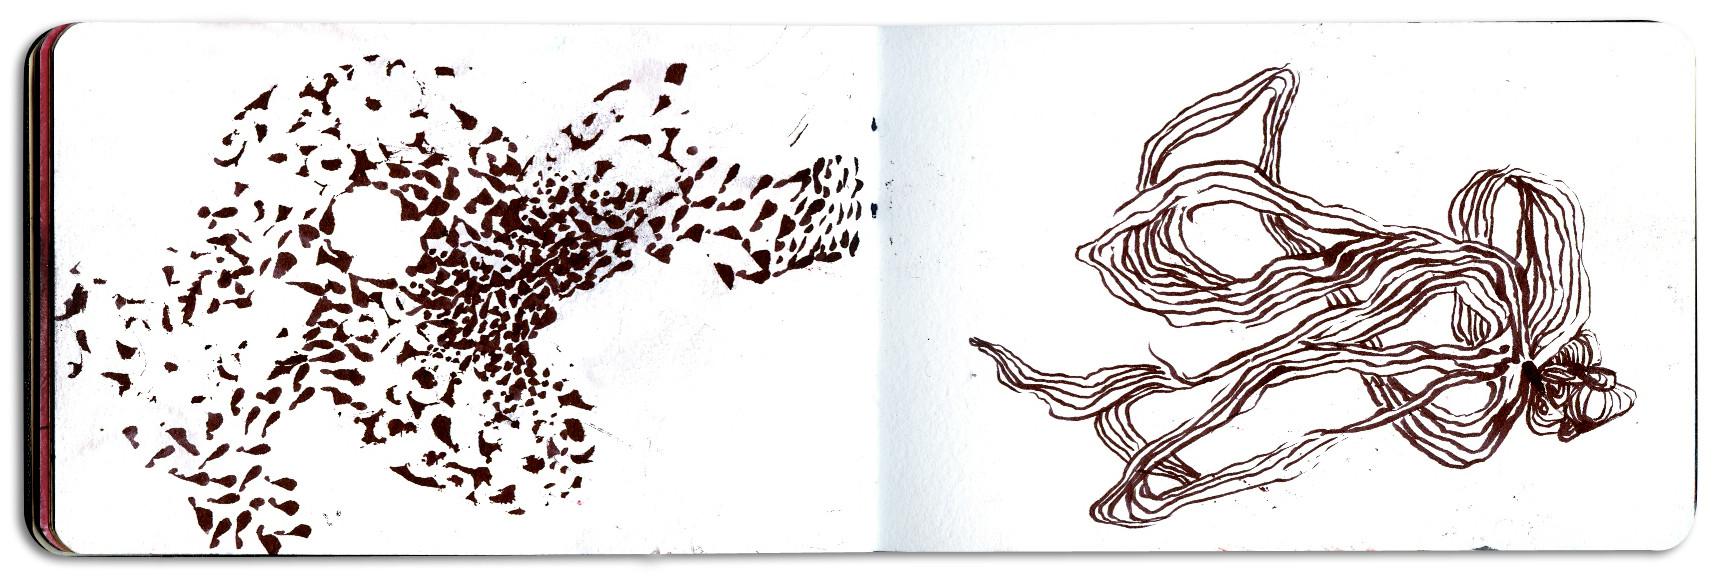 sketchbook small 2011/09